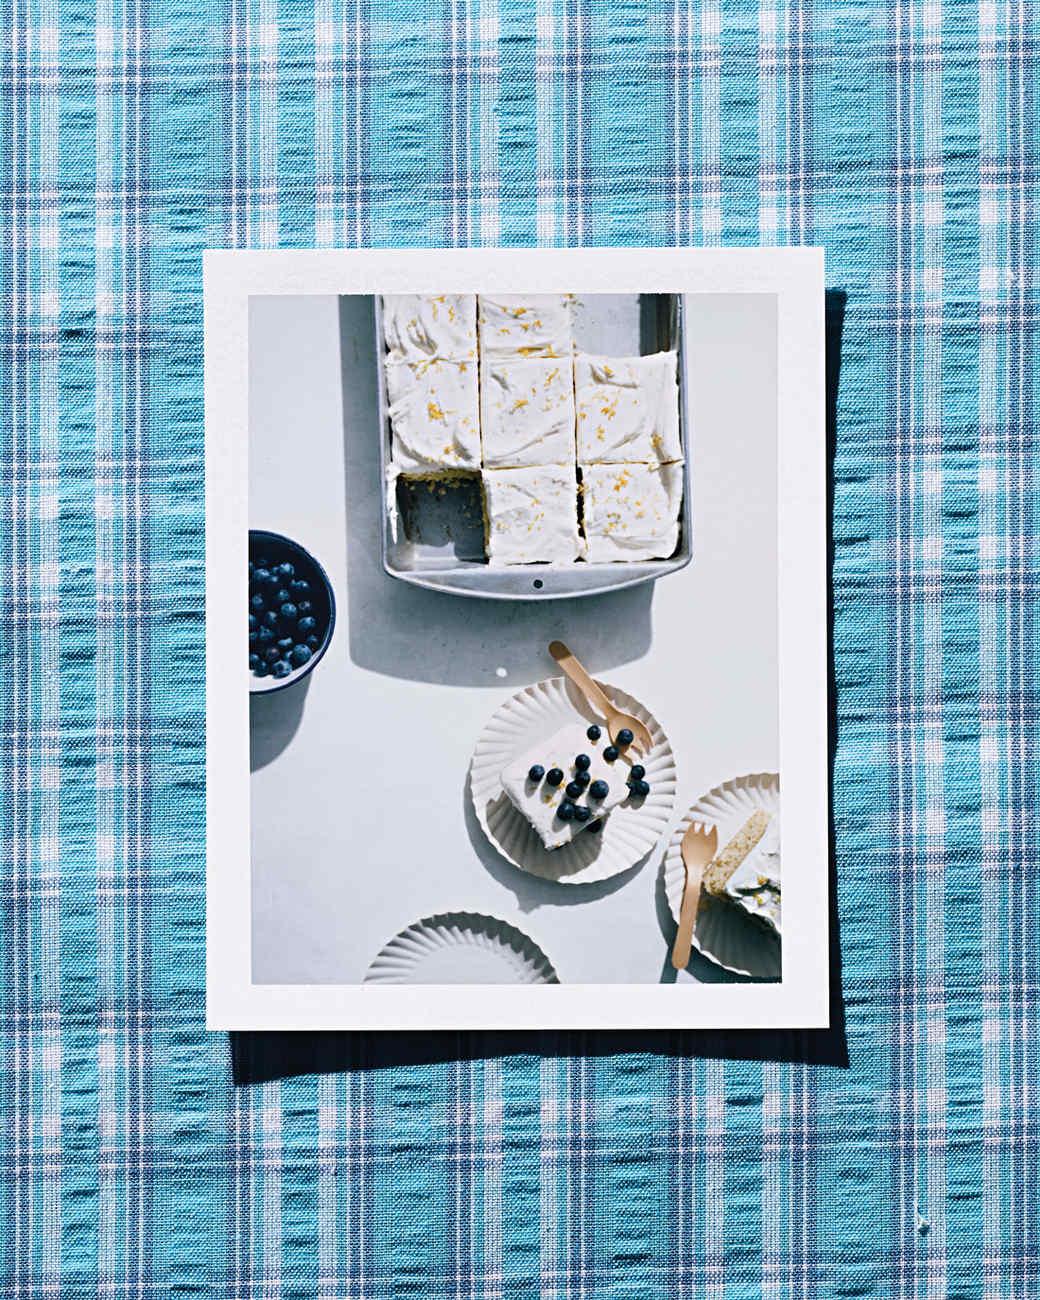 vanilla-sheet-cake-s04-0061-d112928.jpg